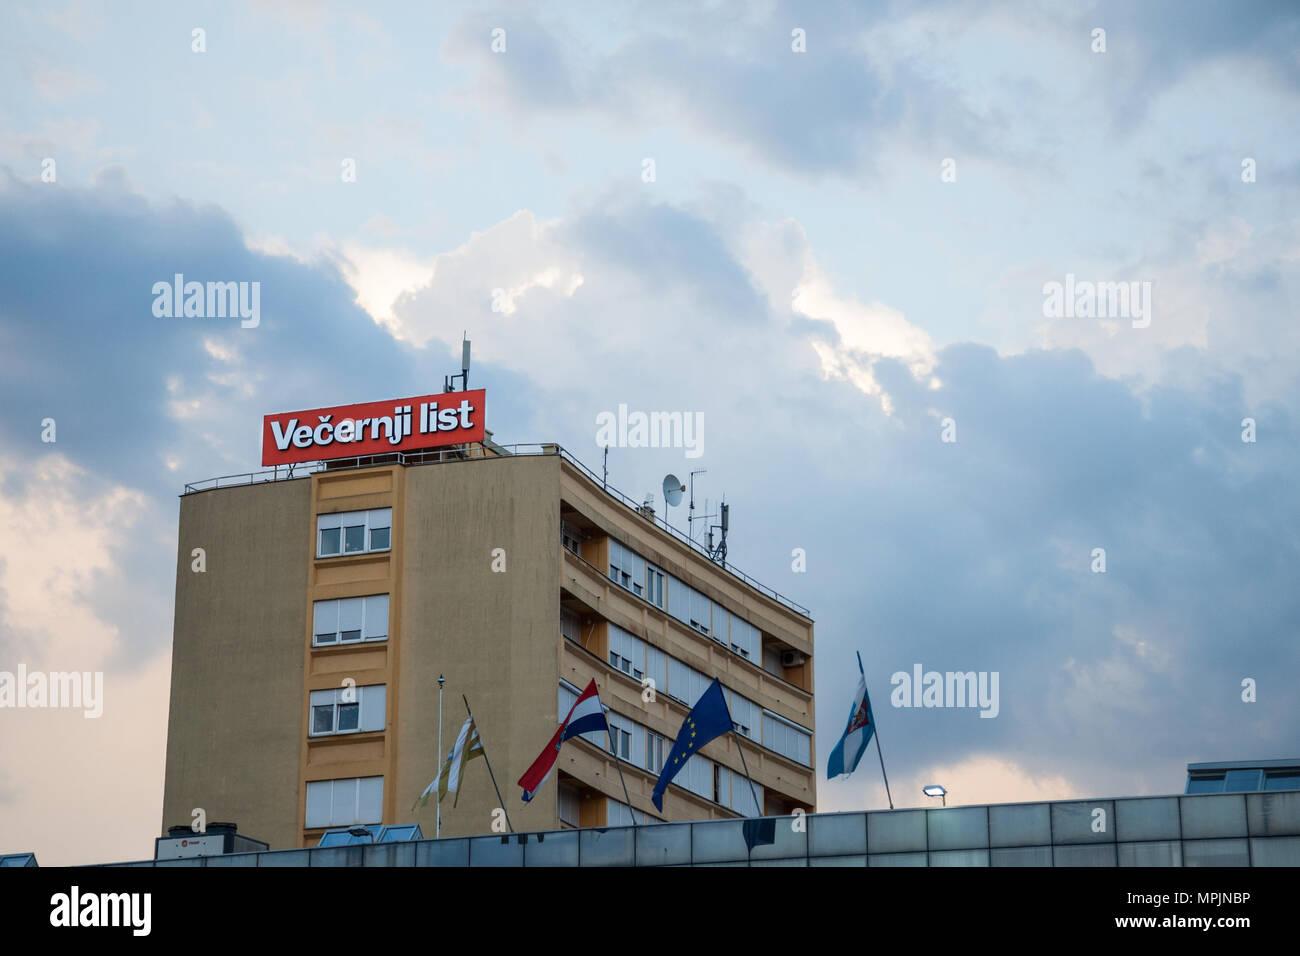 VUKOVAR, CROATIA - MAY 12, 2018: Vecernji List Logo on their local office in Vukovar. Vecernji list, formerly Vecernji Vjesnik, is the main conservati - Stock Image